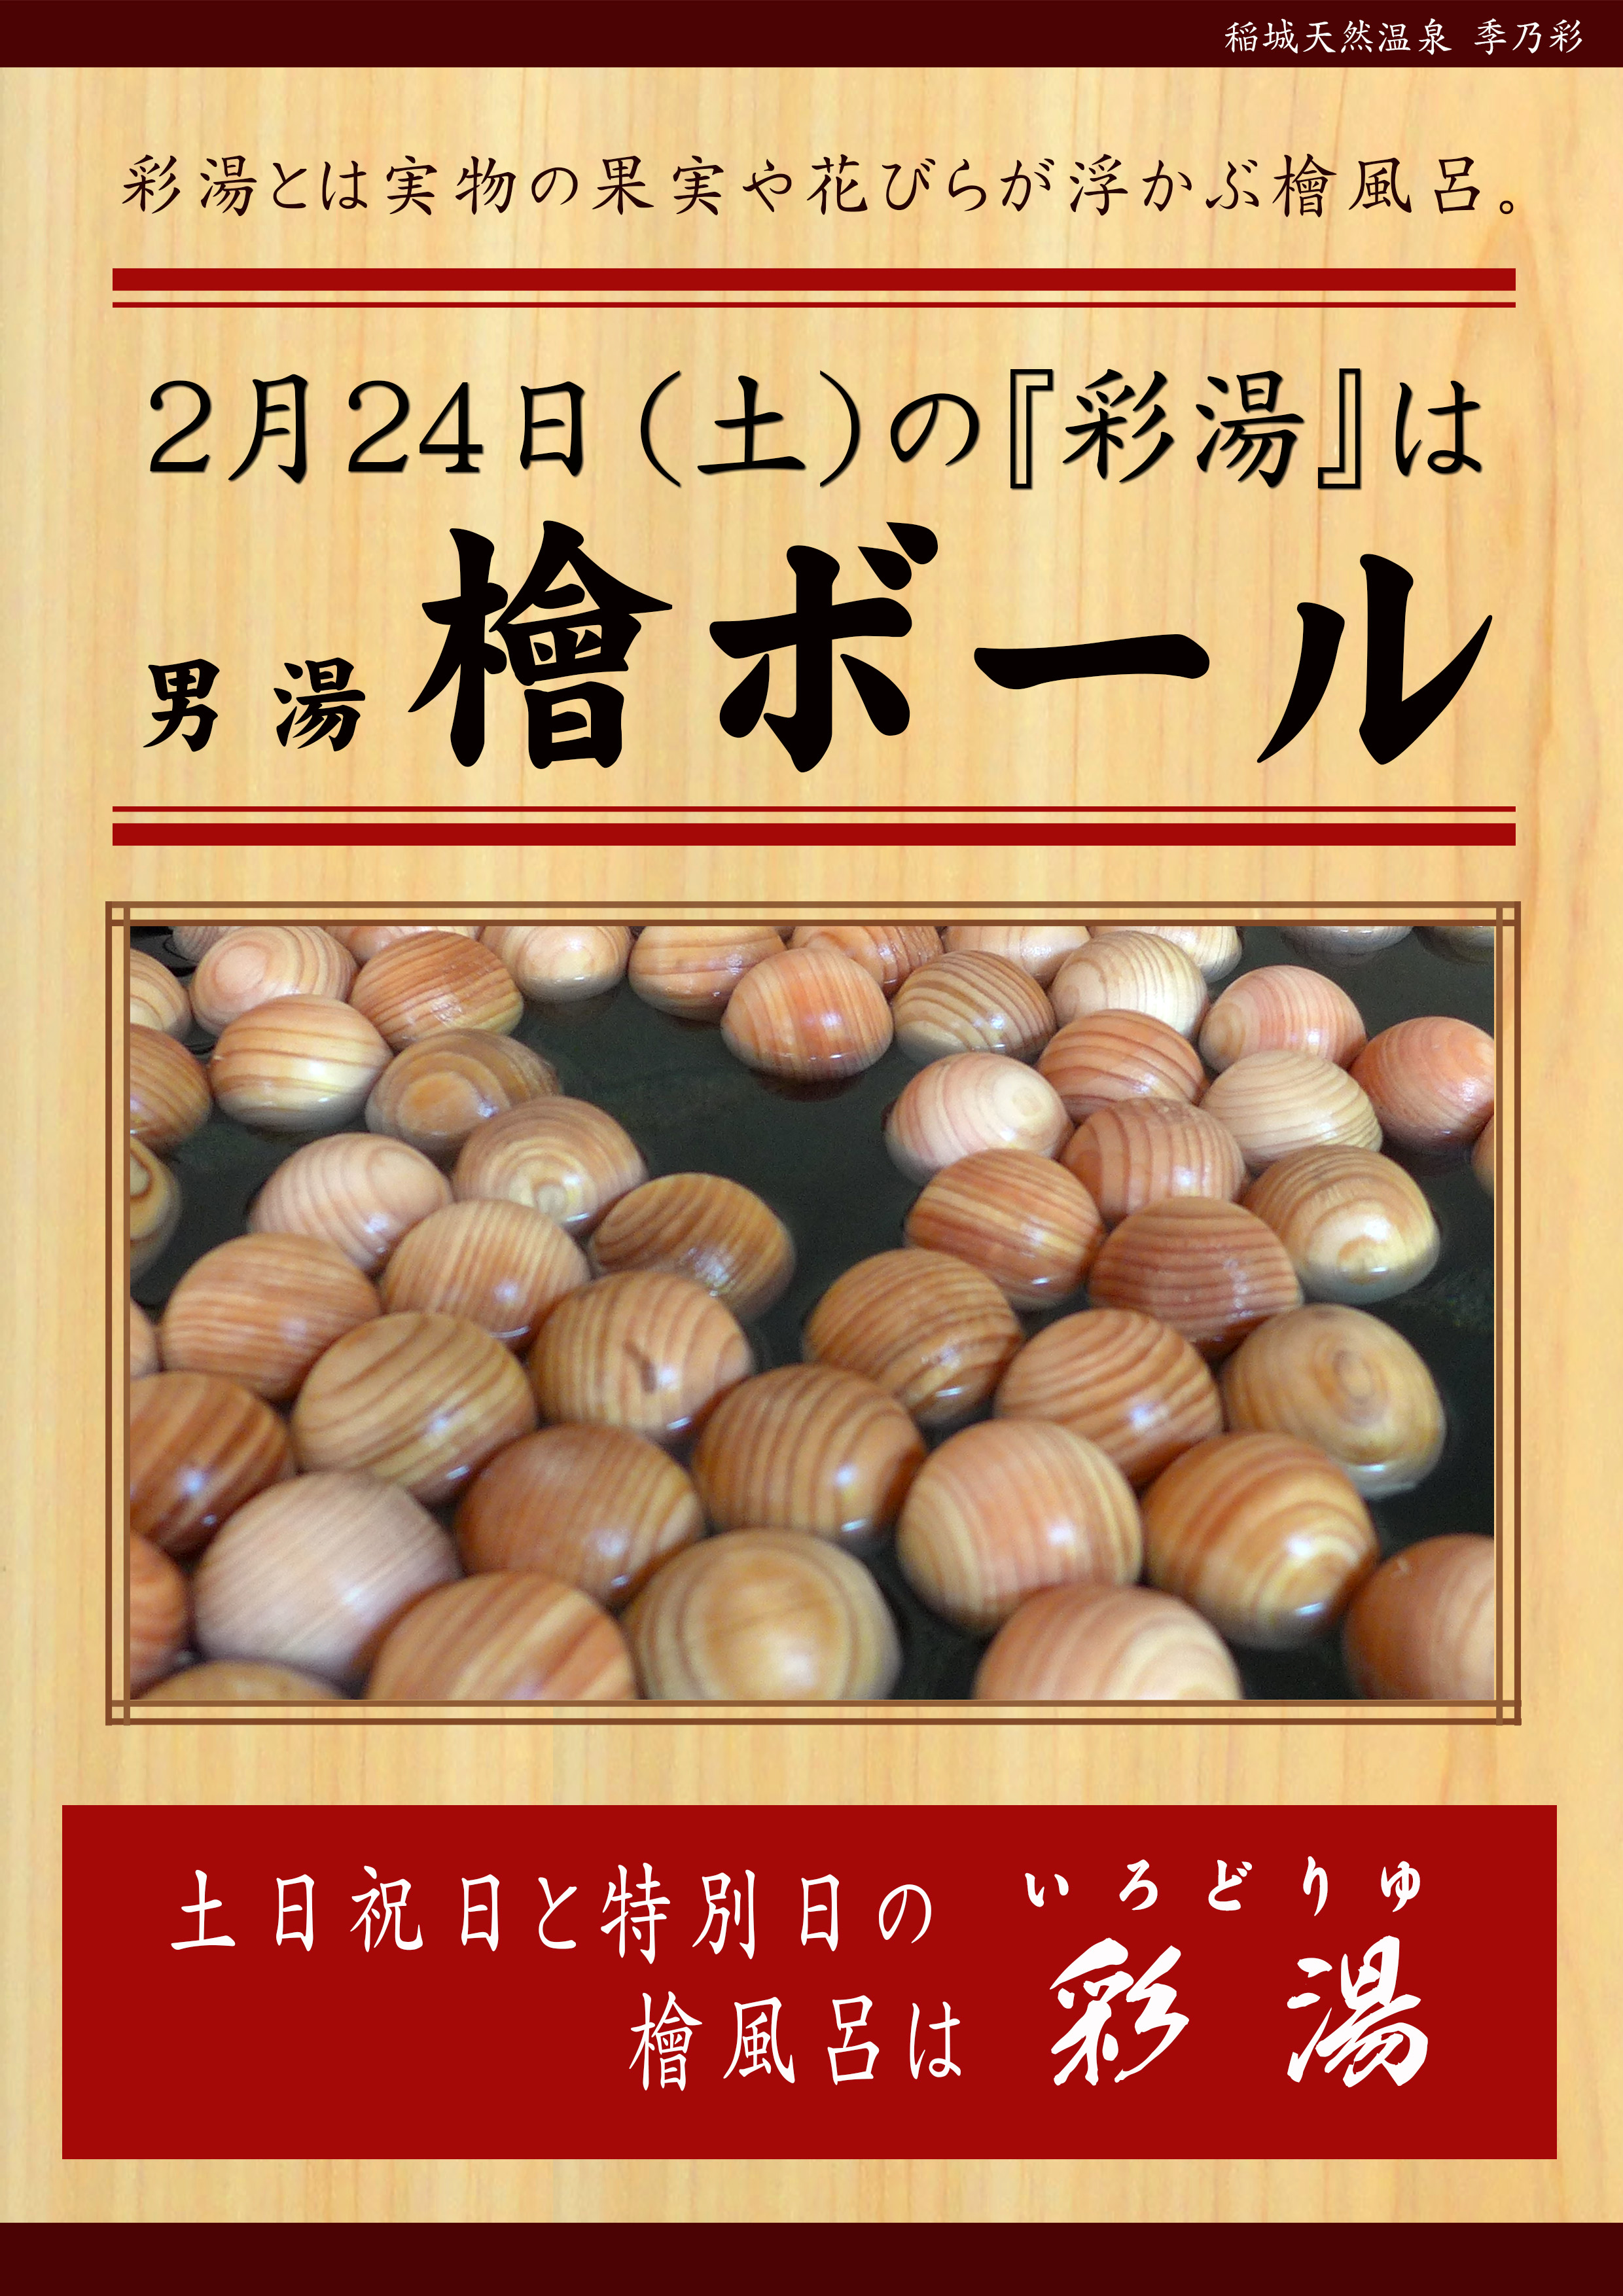 20180224POP イベント 彩湯 男湯 檜ボール